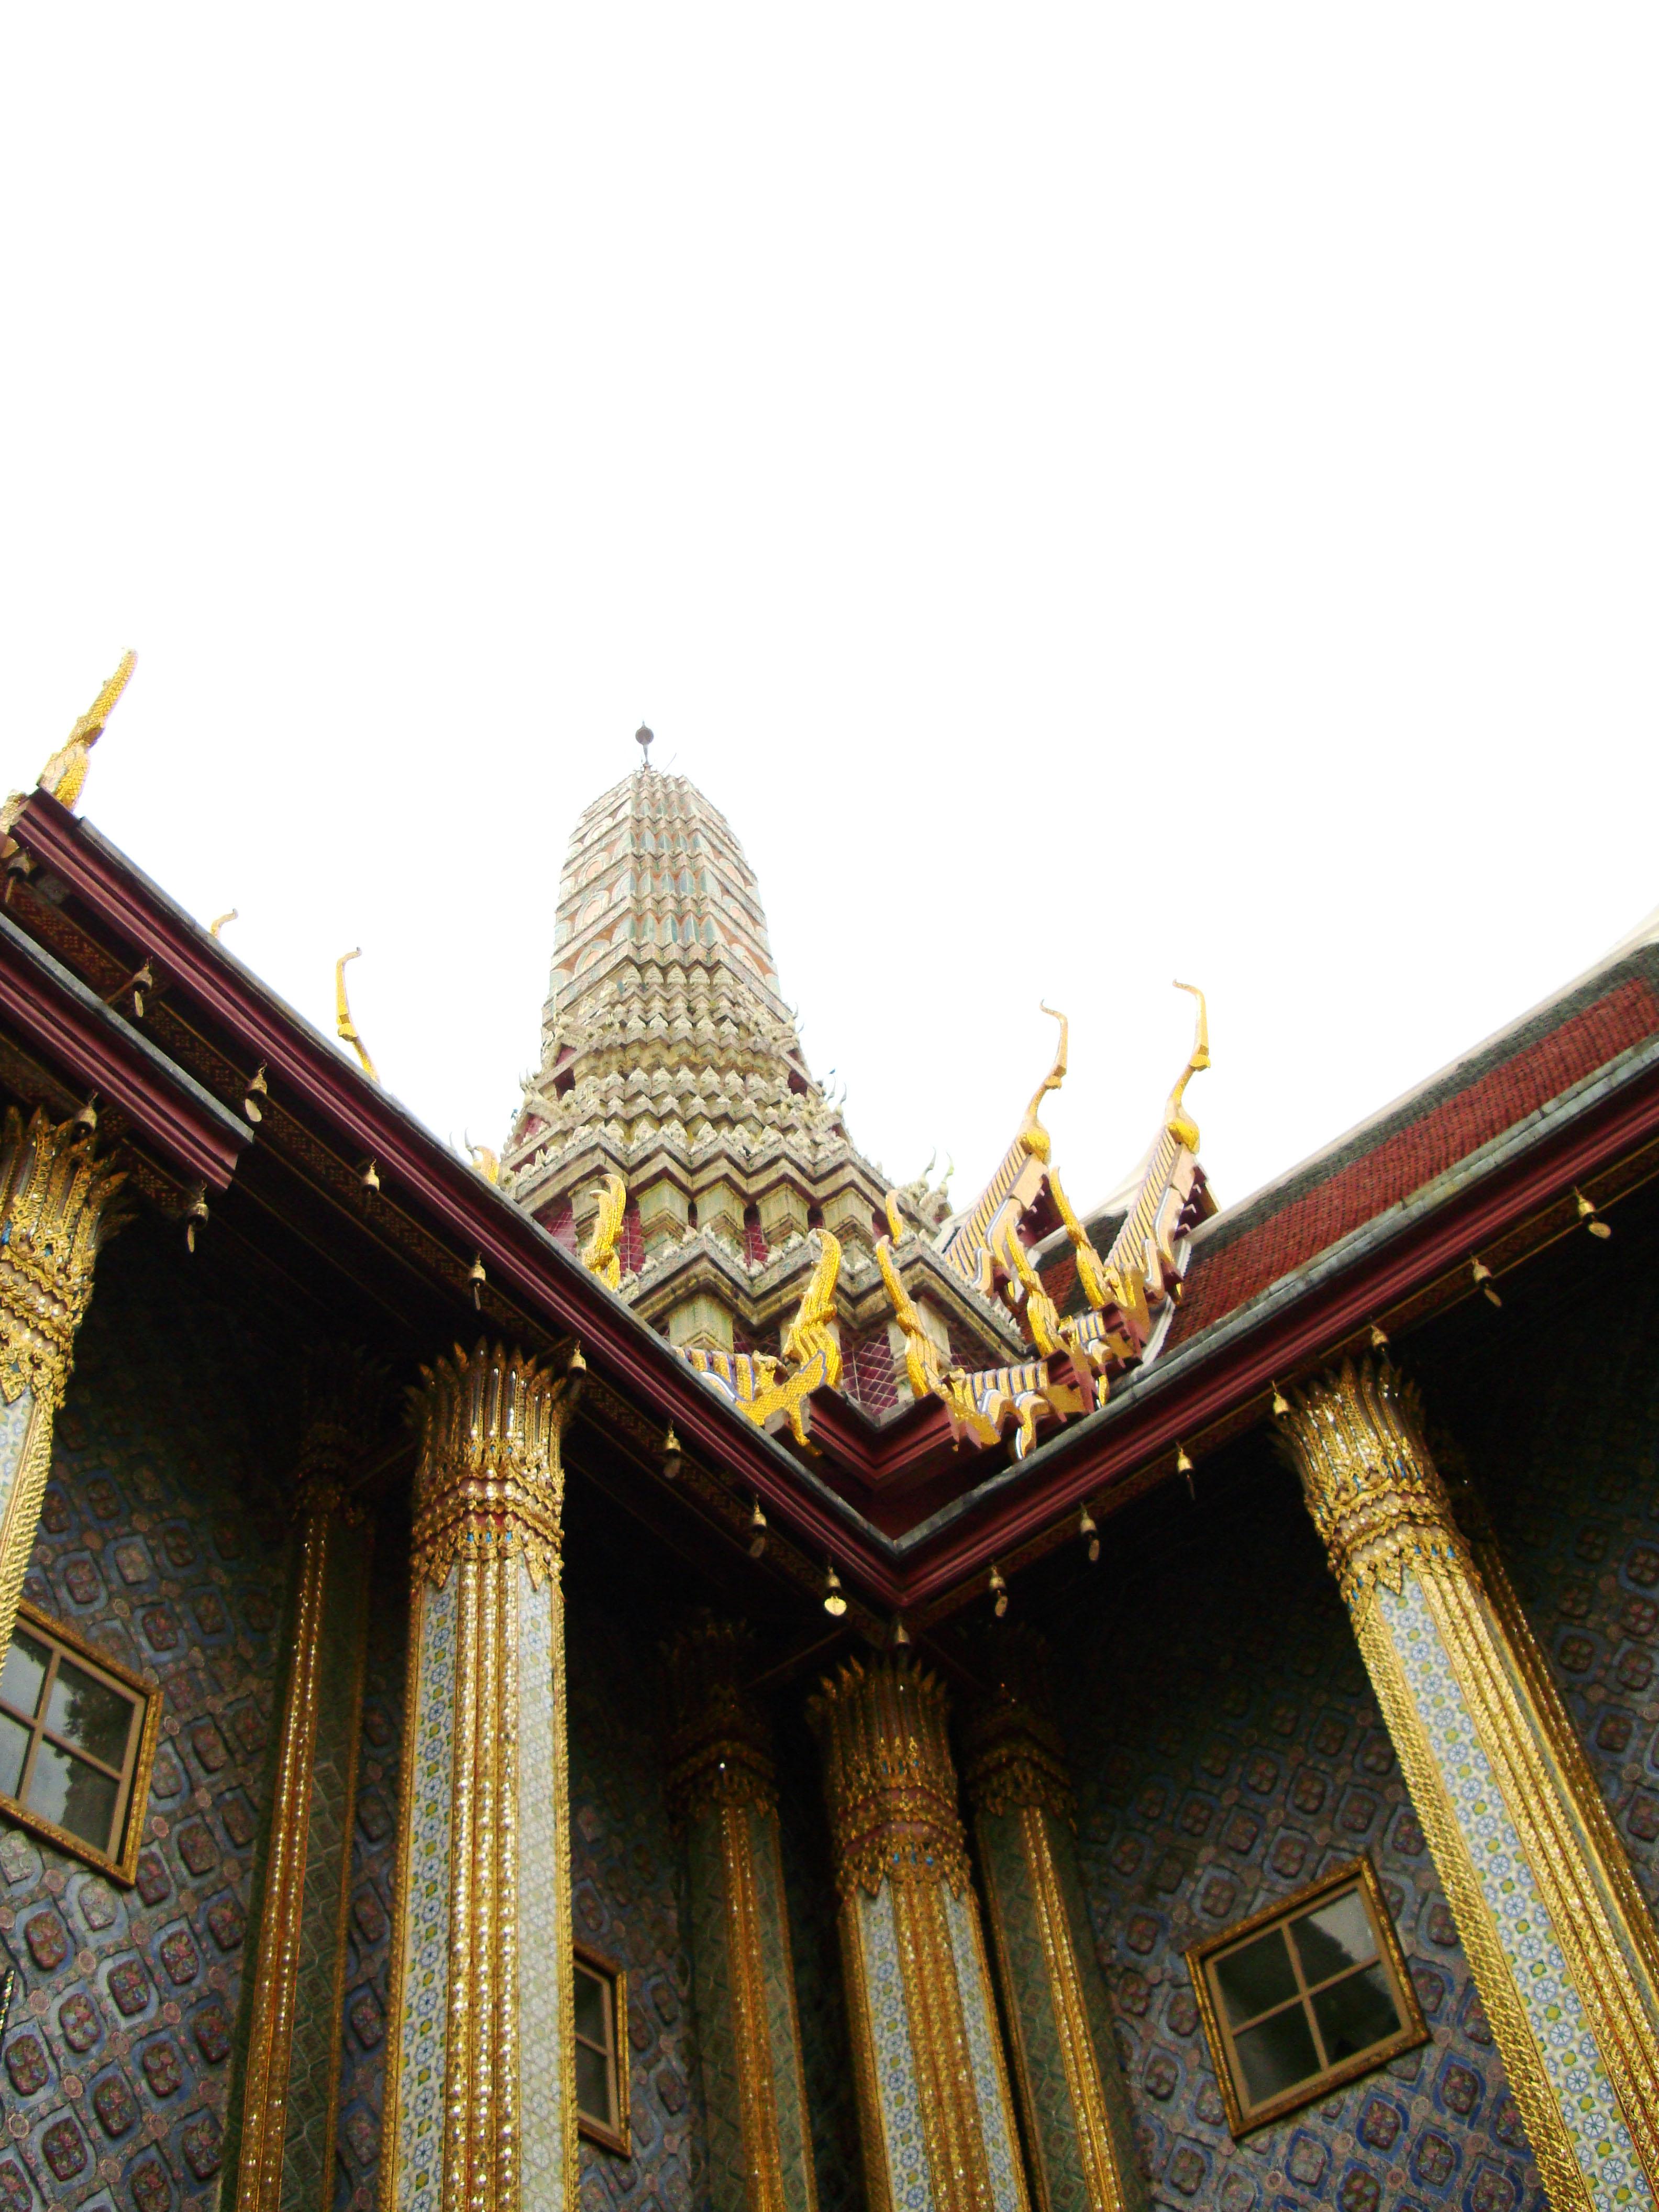 09 Prasat Phra Dhepbidorn intercrit designed walls and pillars Grand Palace 2010 08